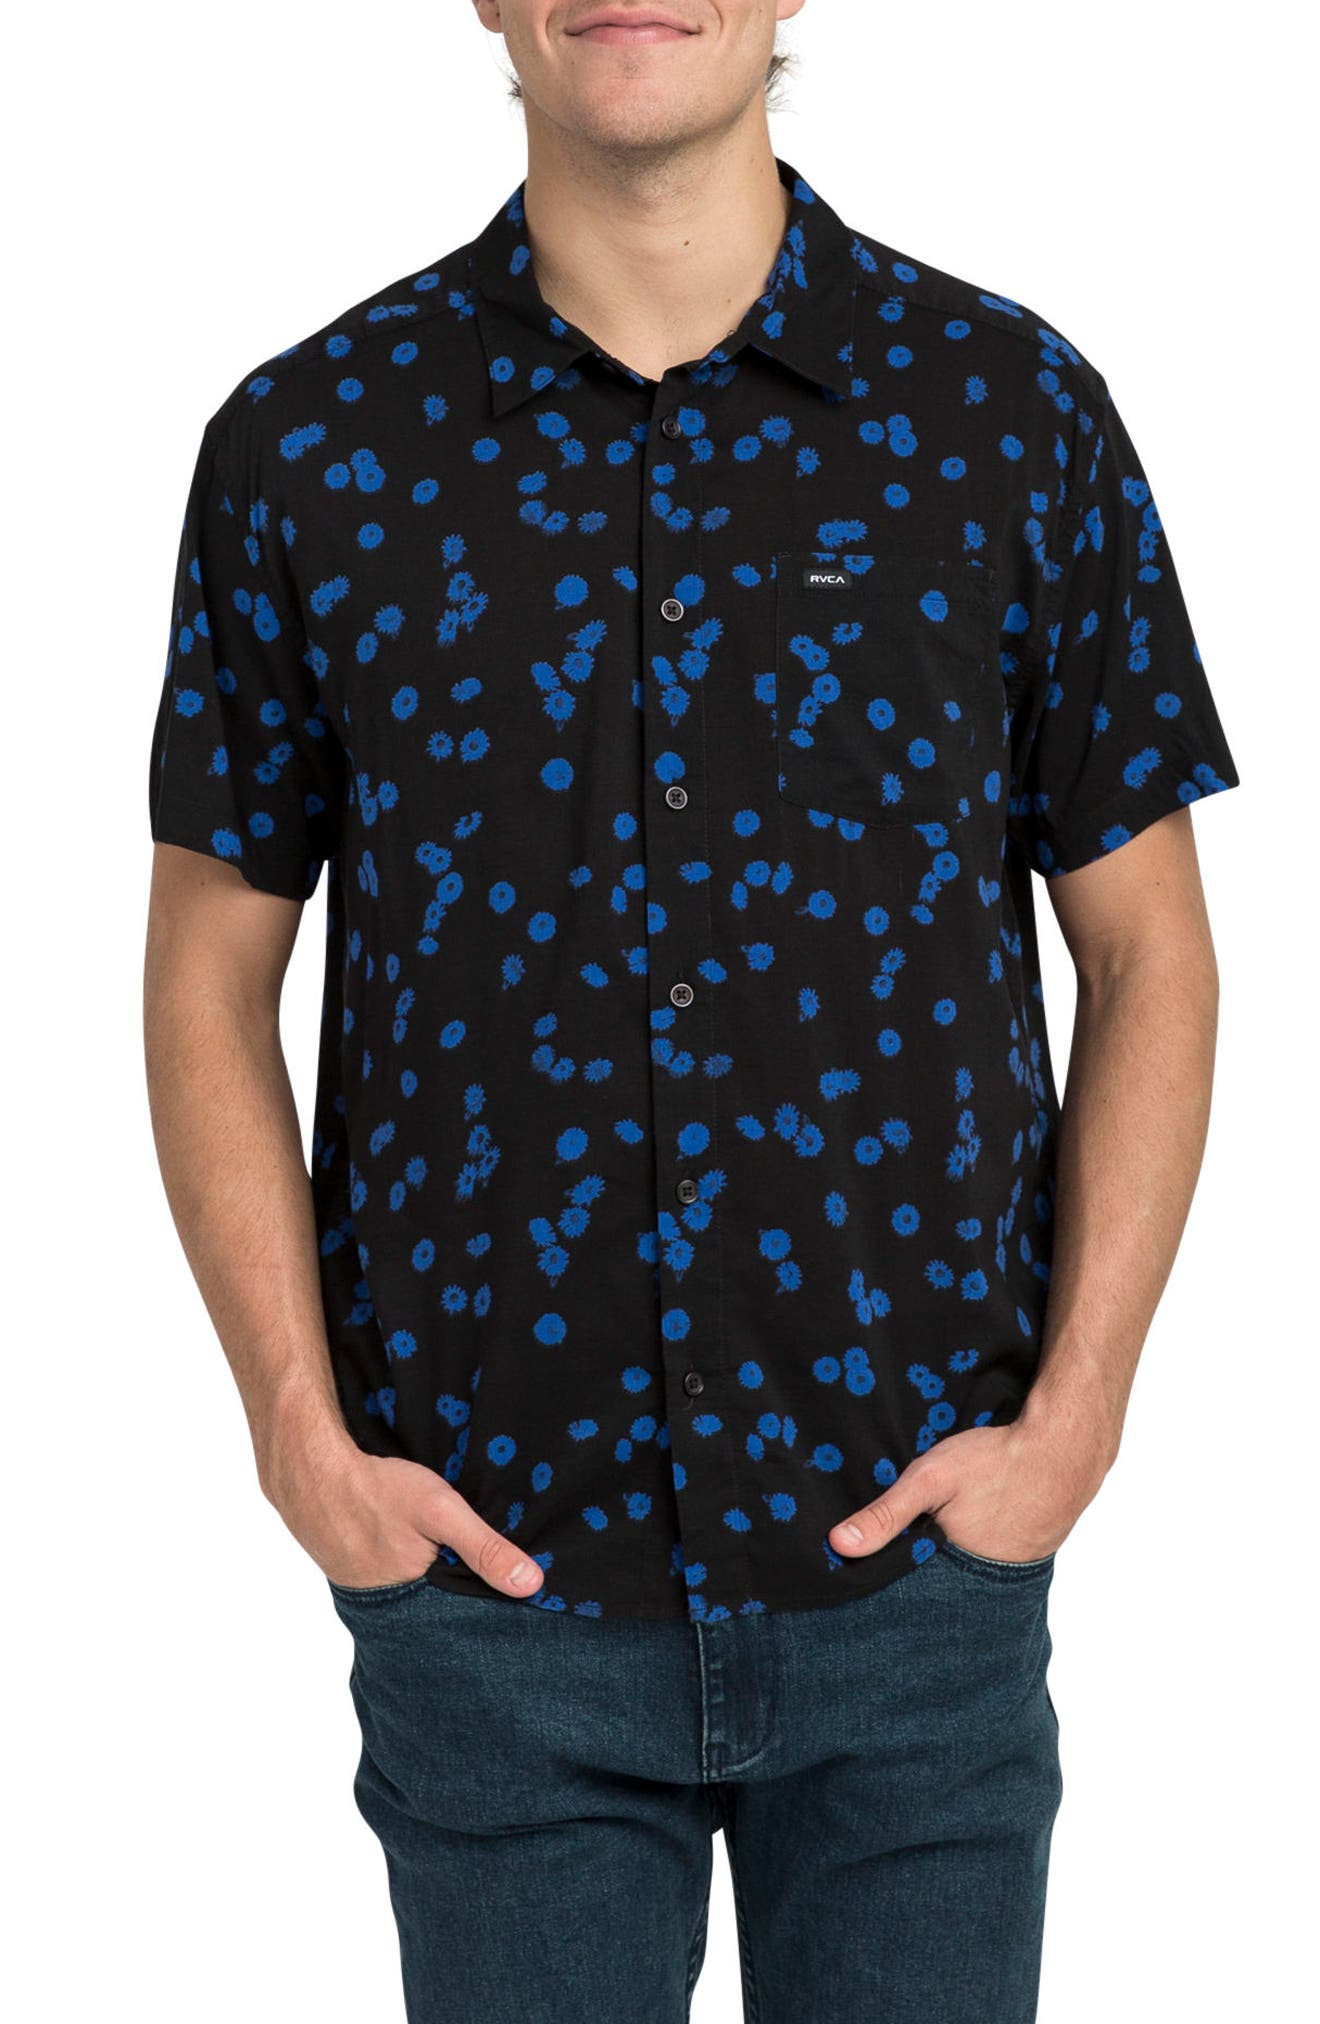 Overdye Floral Shirt,                         Main,                         color, 001